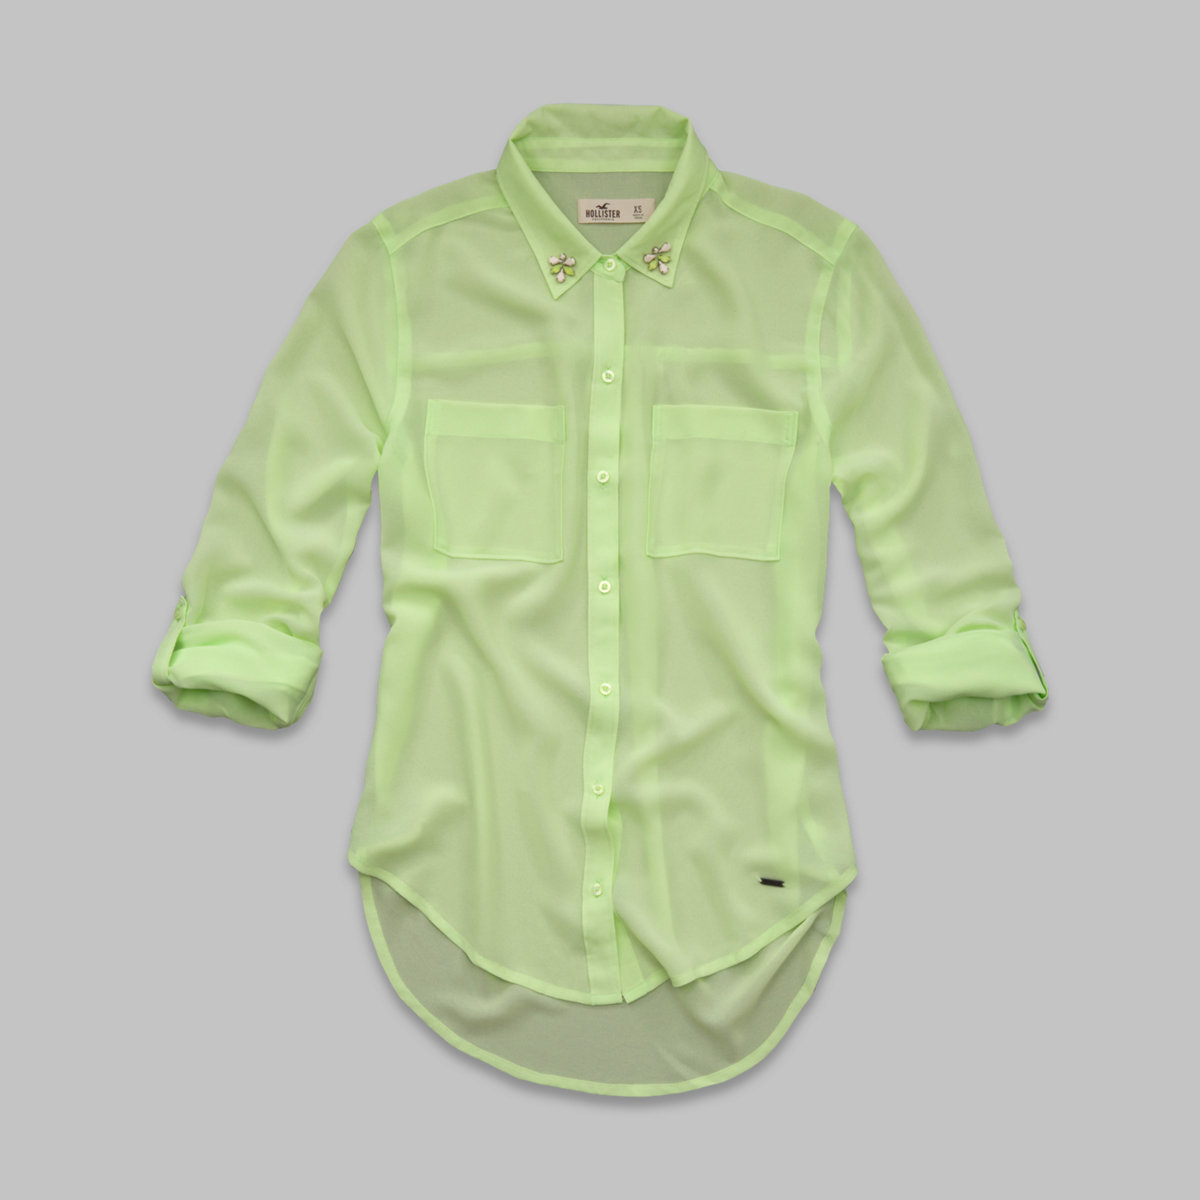 Solana Beach Embellished Collar Chiffon Shirt